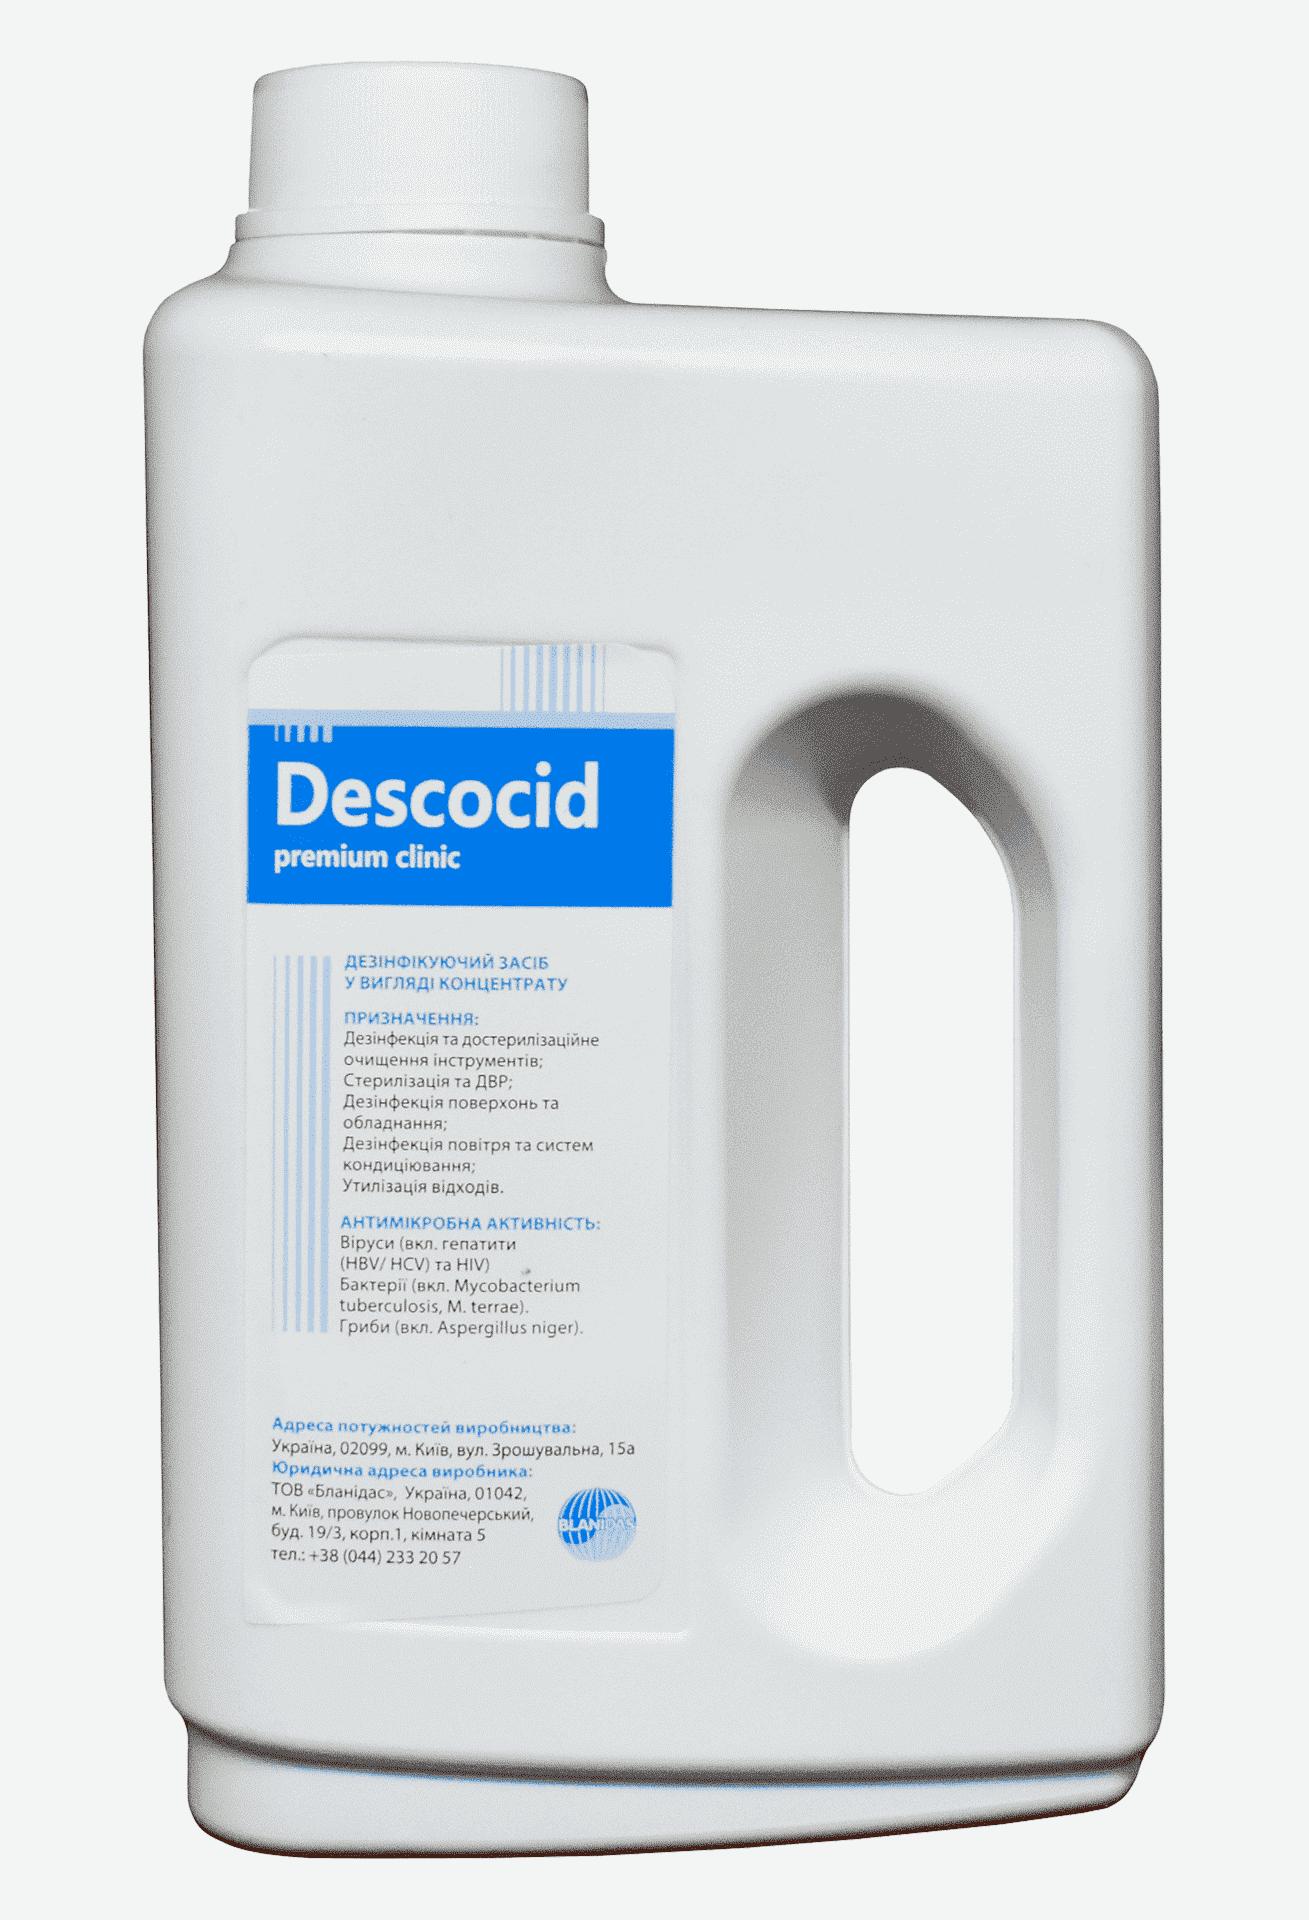 Дескоцид преміум клінік, 2.5л